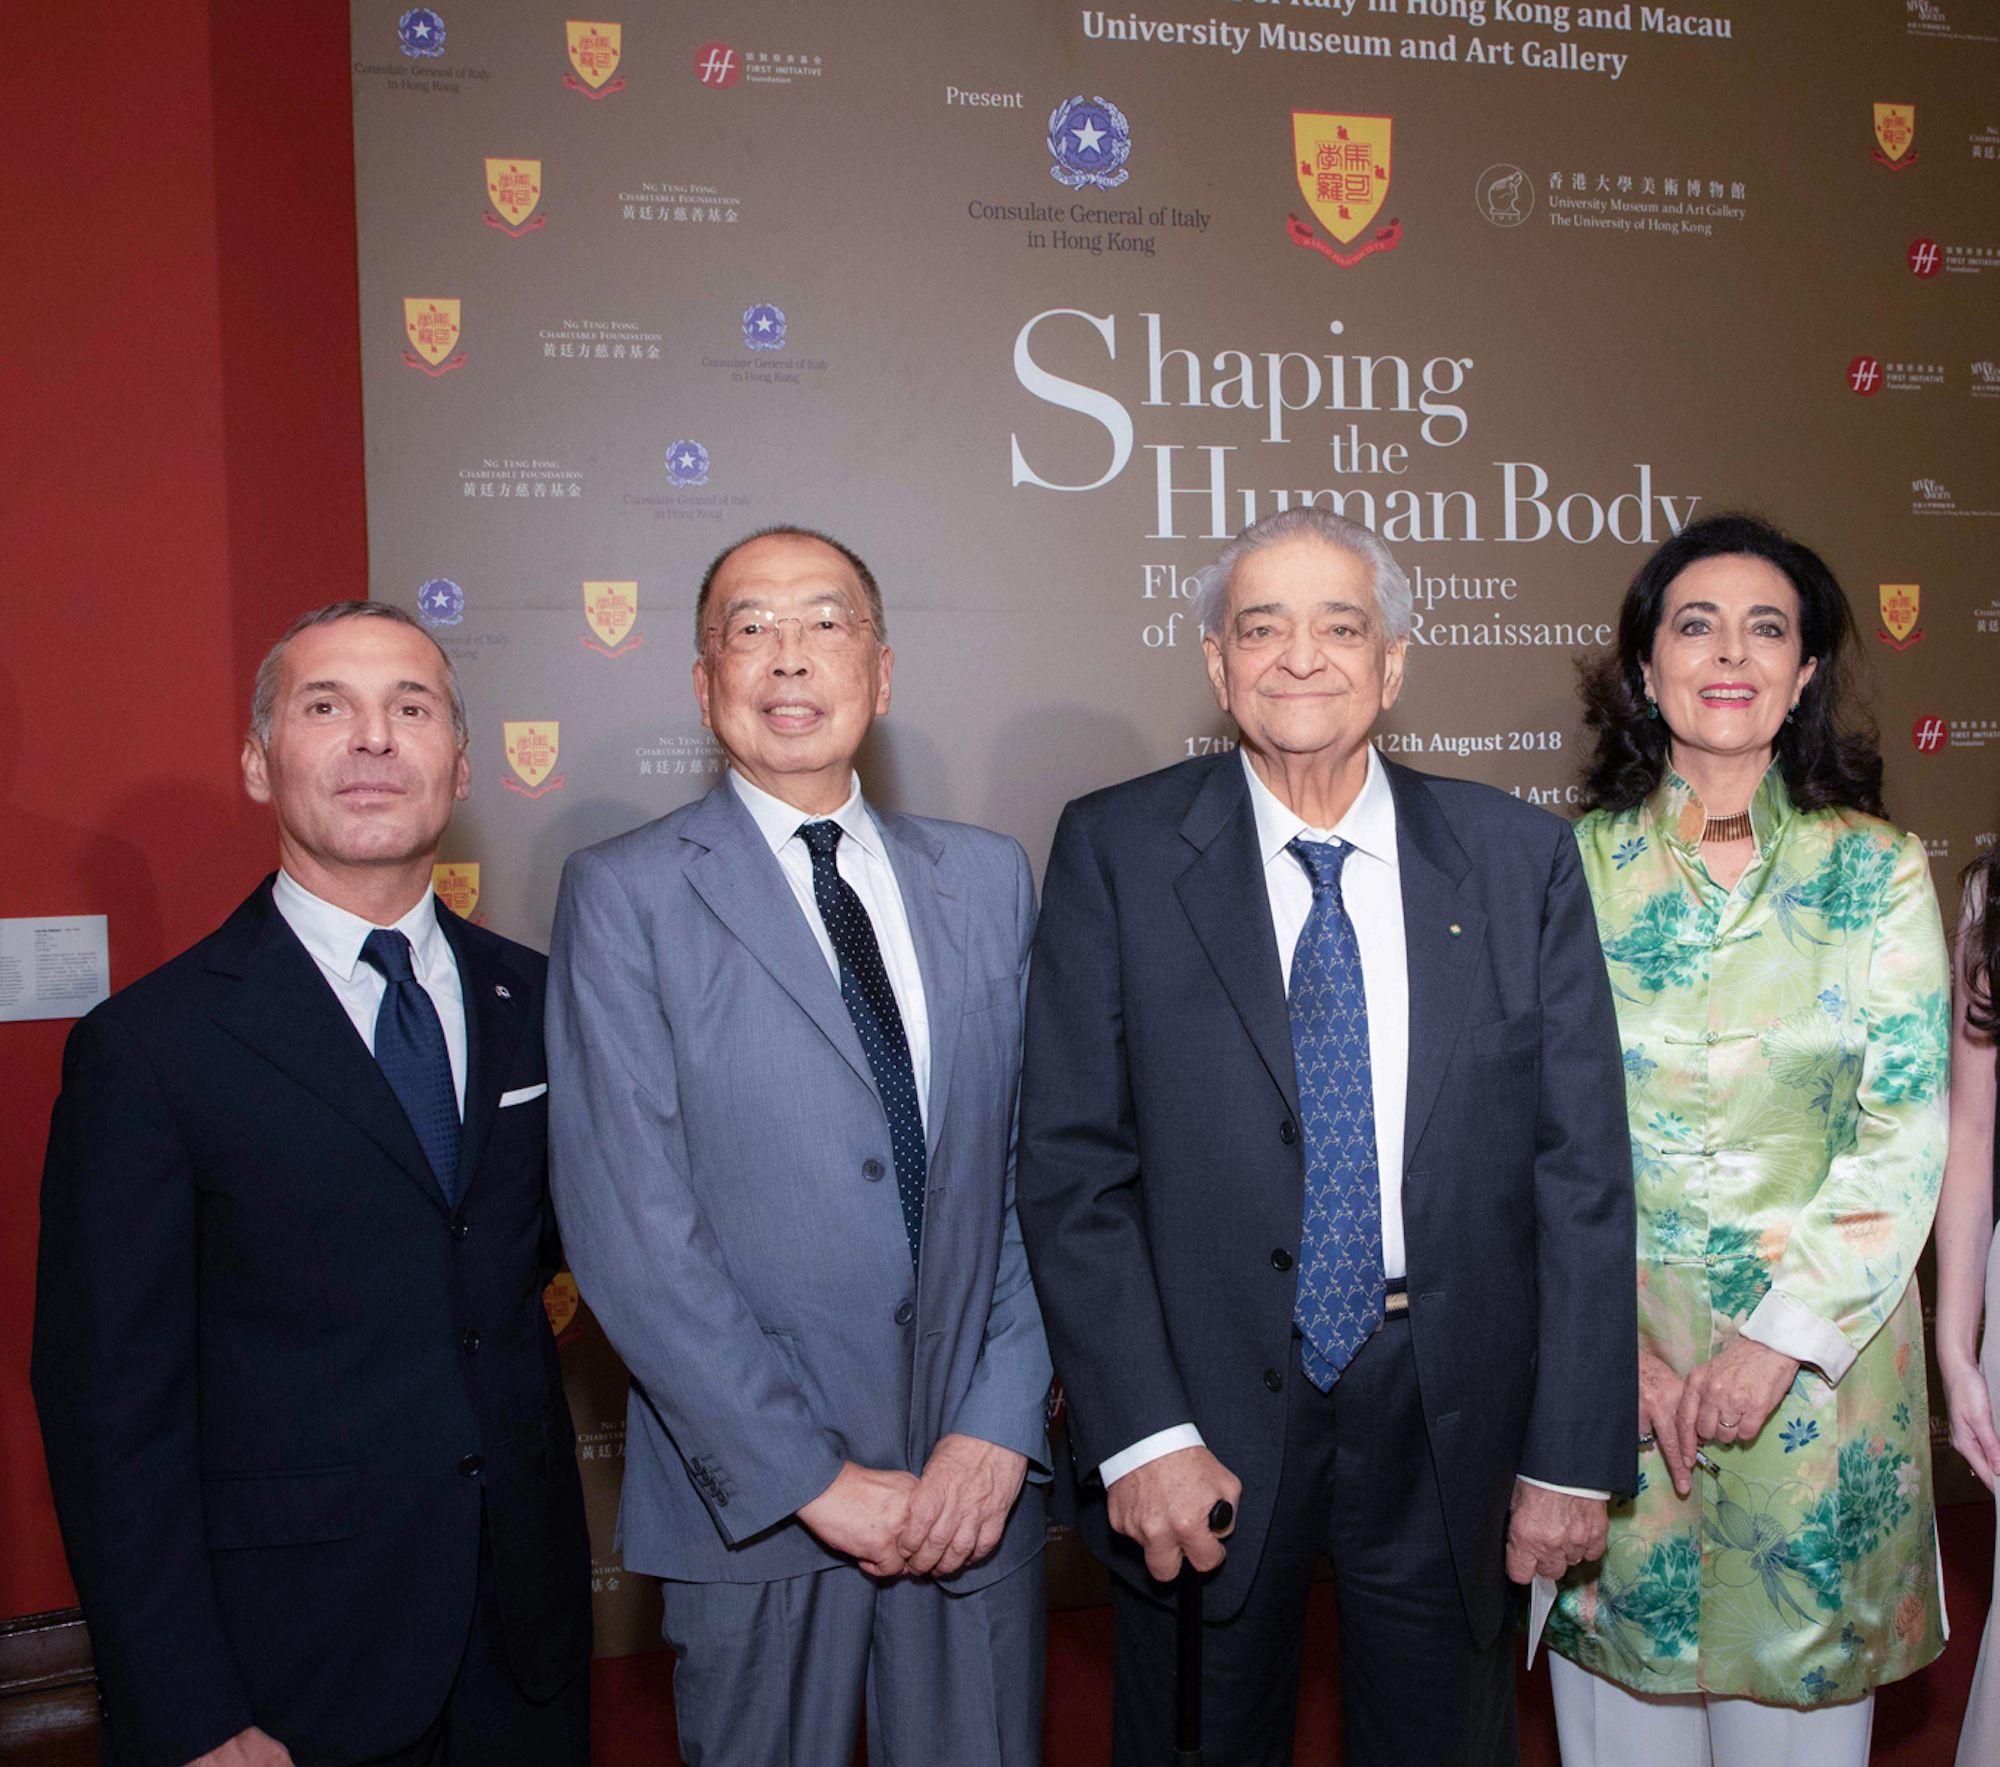 William Figliola, David Cheung, Luigi Bellini, Francesca Bellini